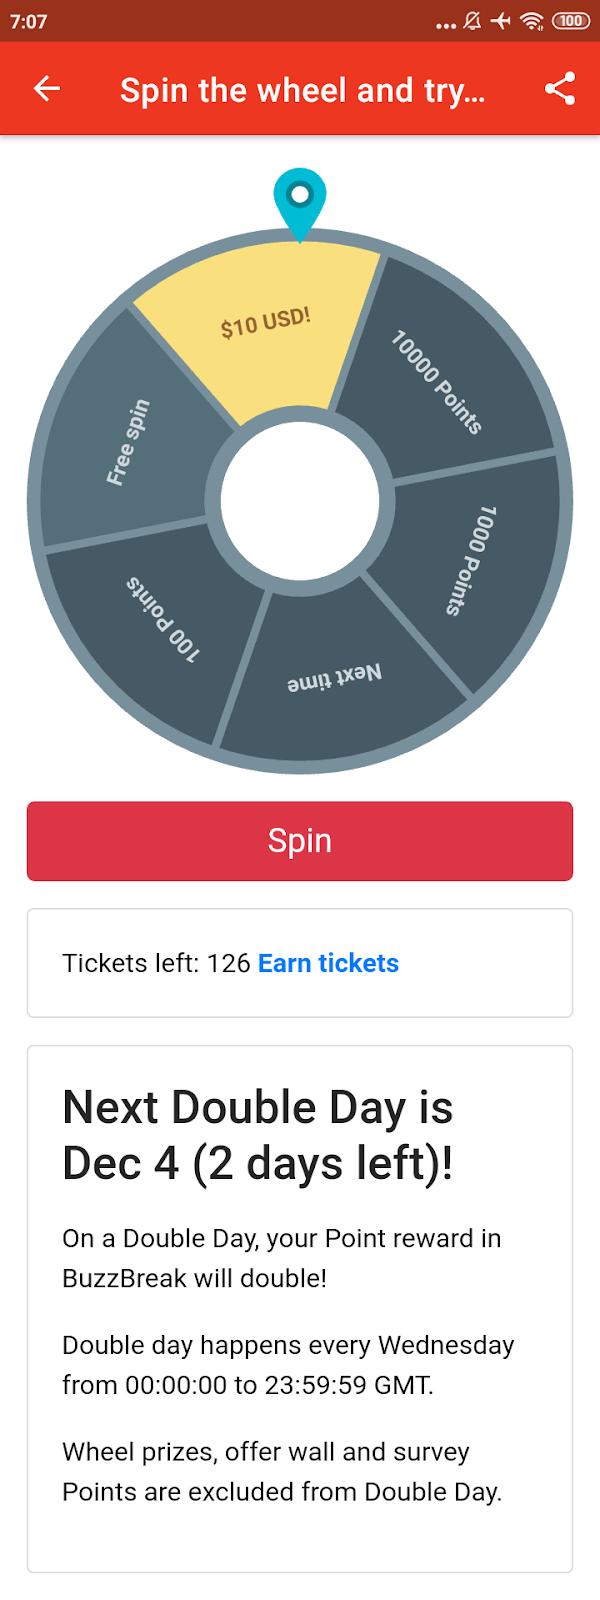 Mendapatkan hadiah dollar Paypal secara cepat Gratis $10 Dollar Dari Aplikasi Baca Berita Buzzbreak